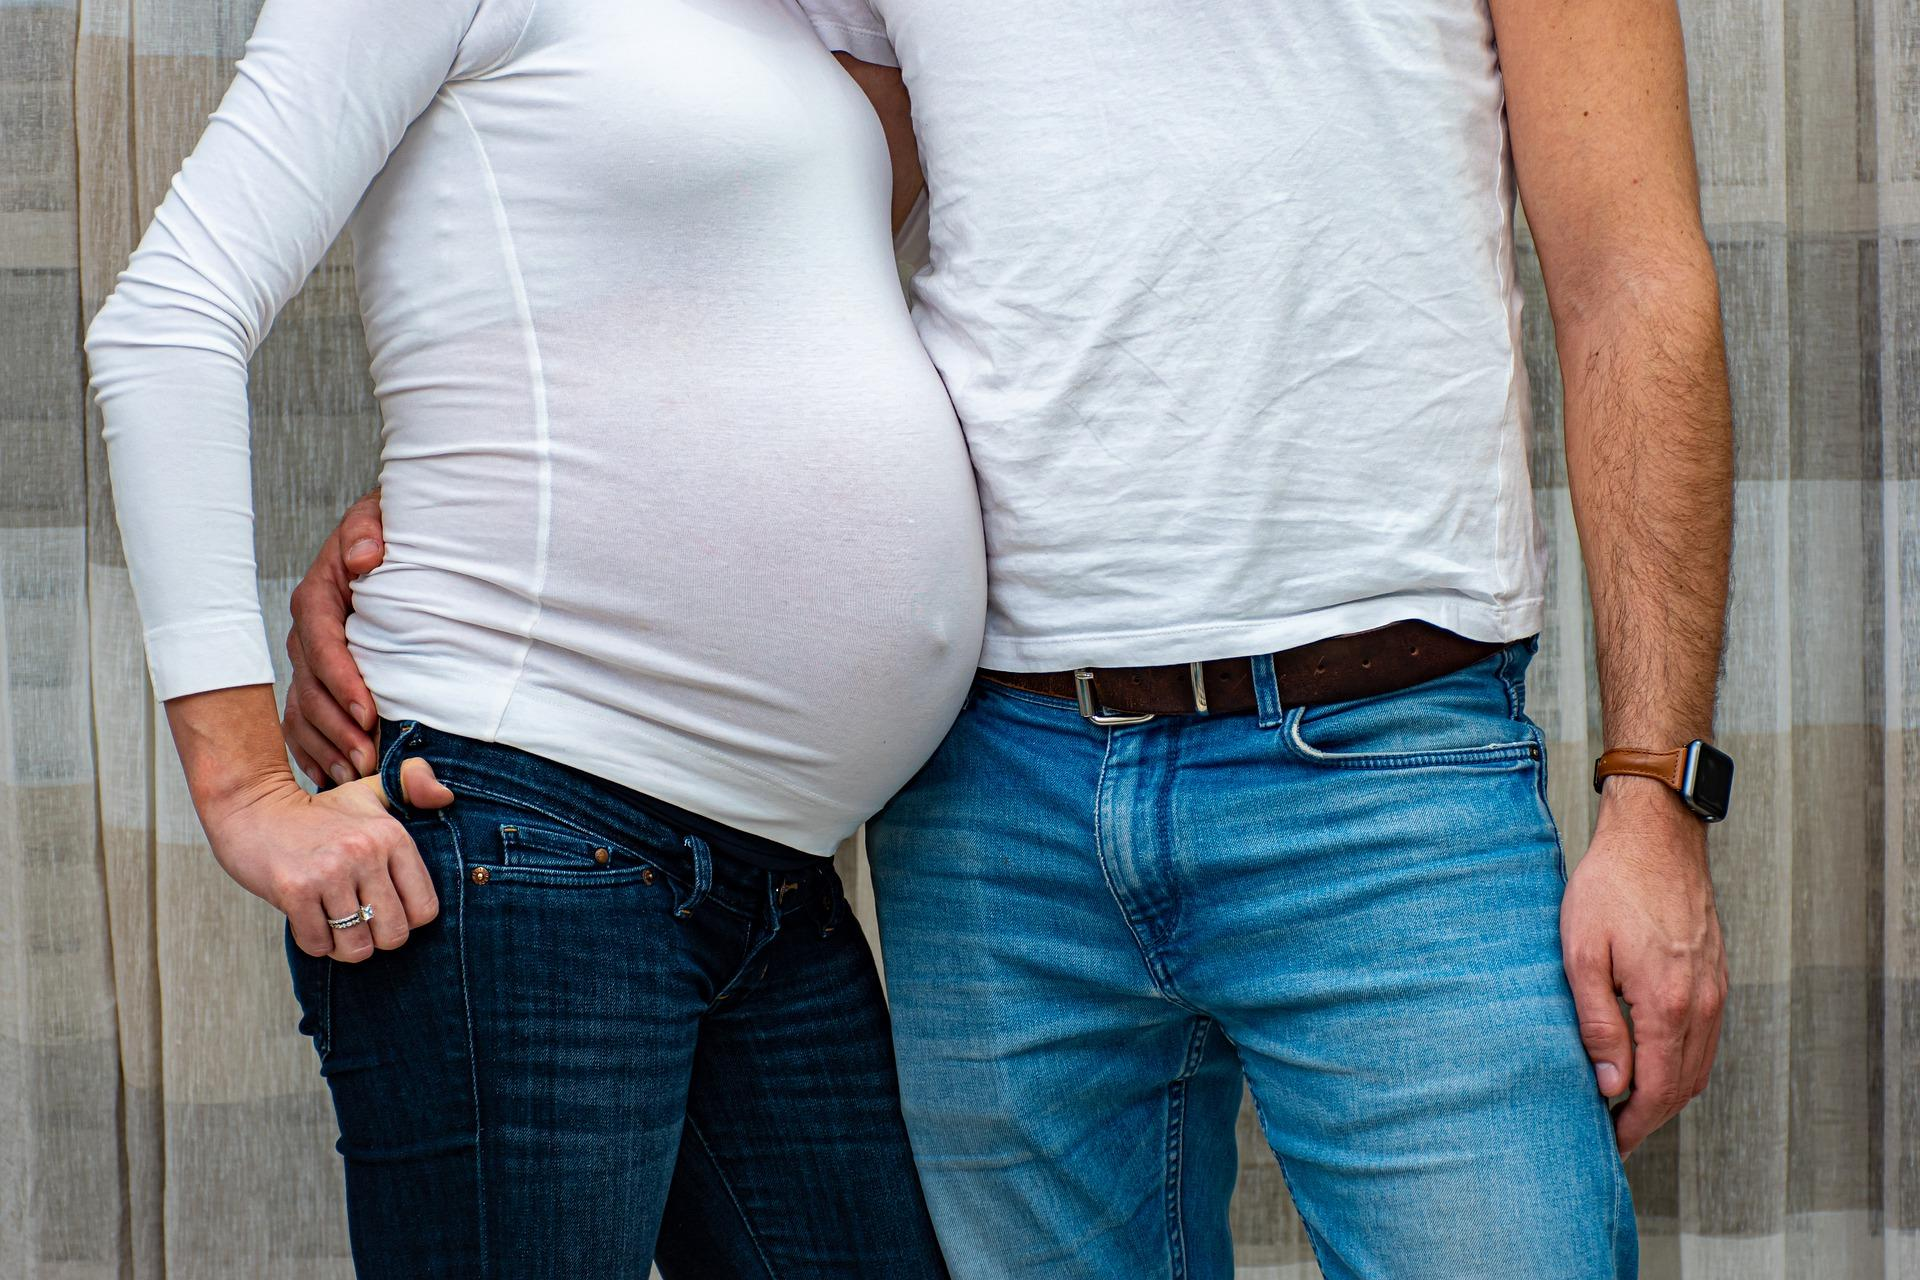 Pregnancy 4828378 1920